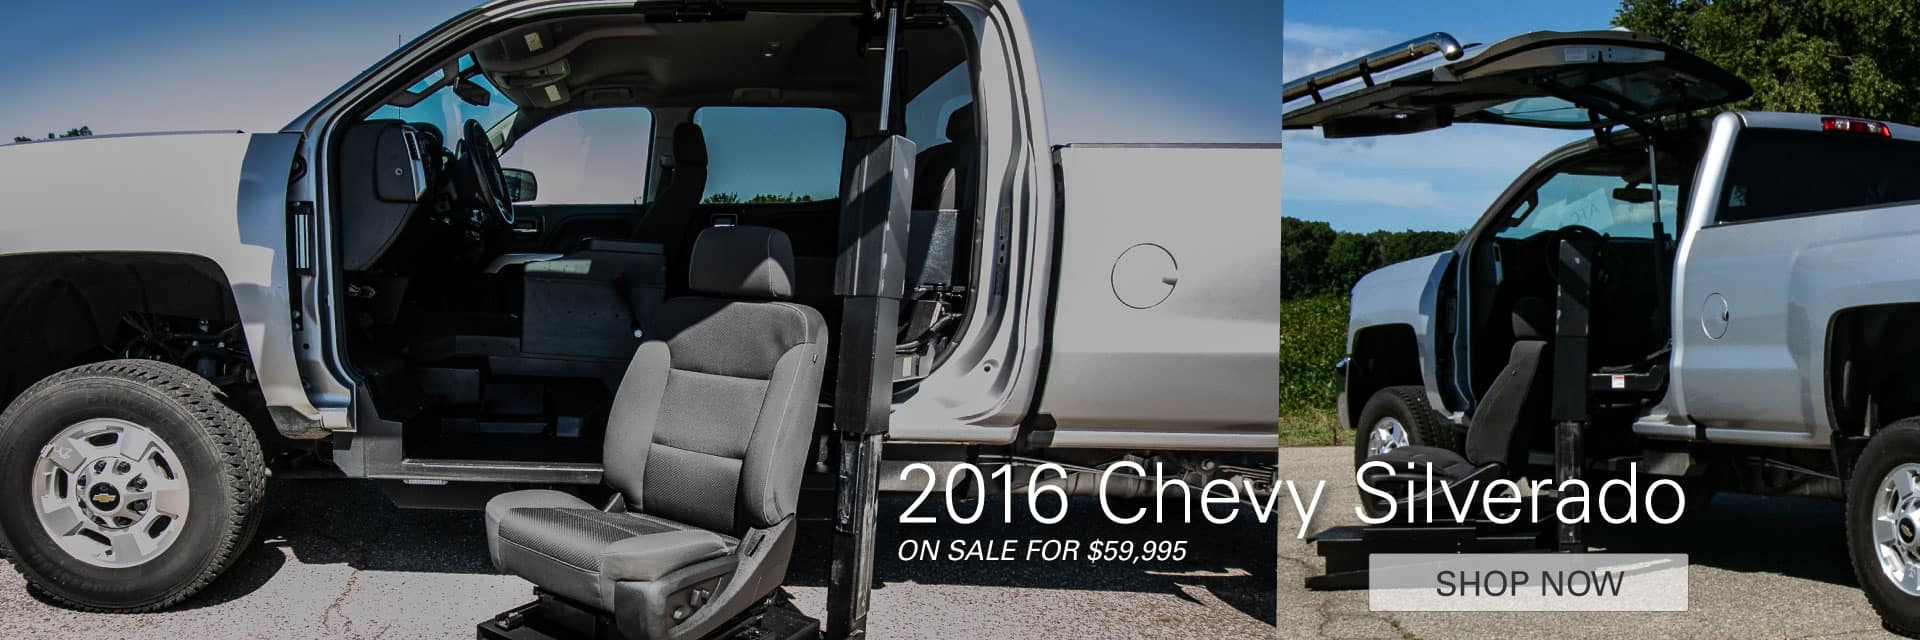 2016 Chevy Silverado On Sale For $59,995